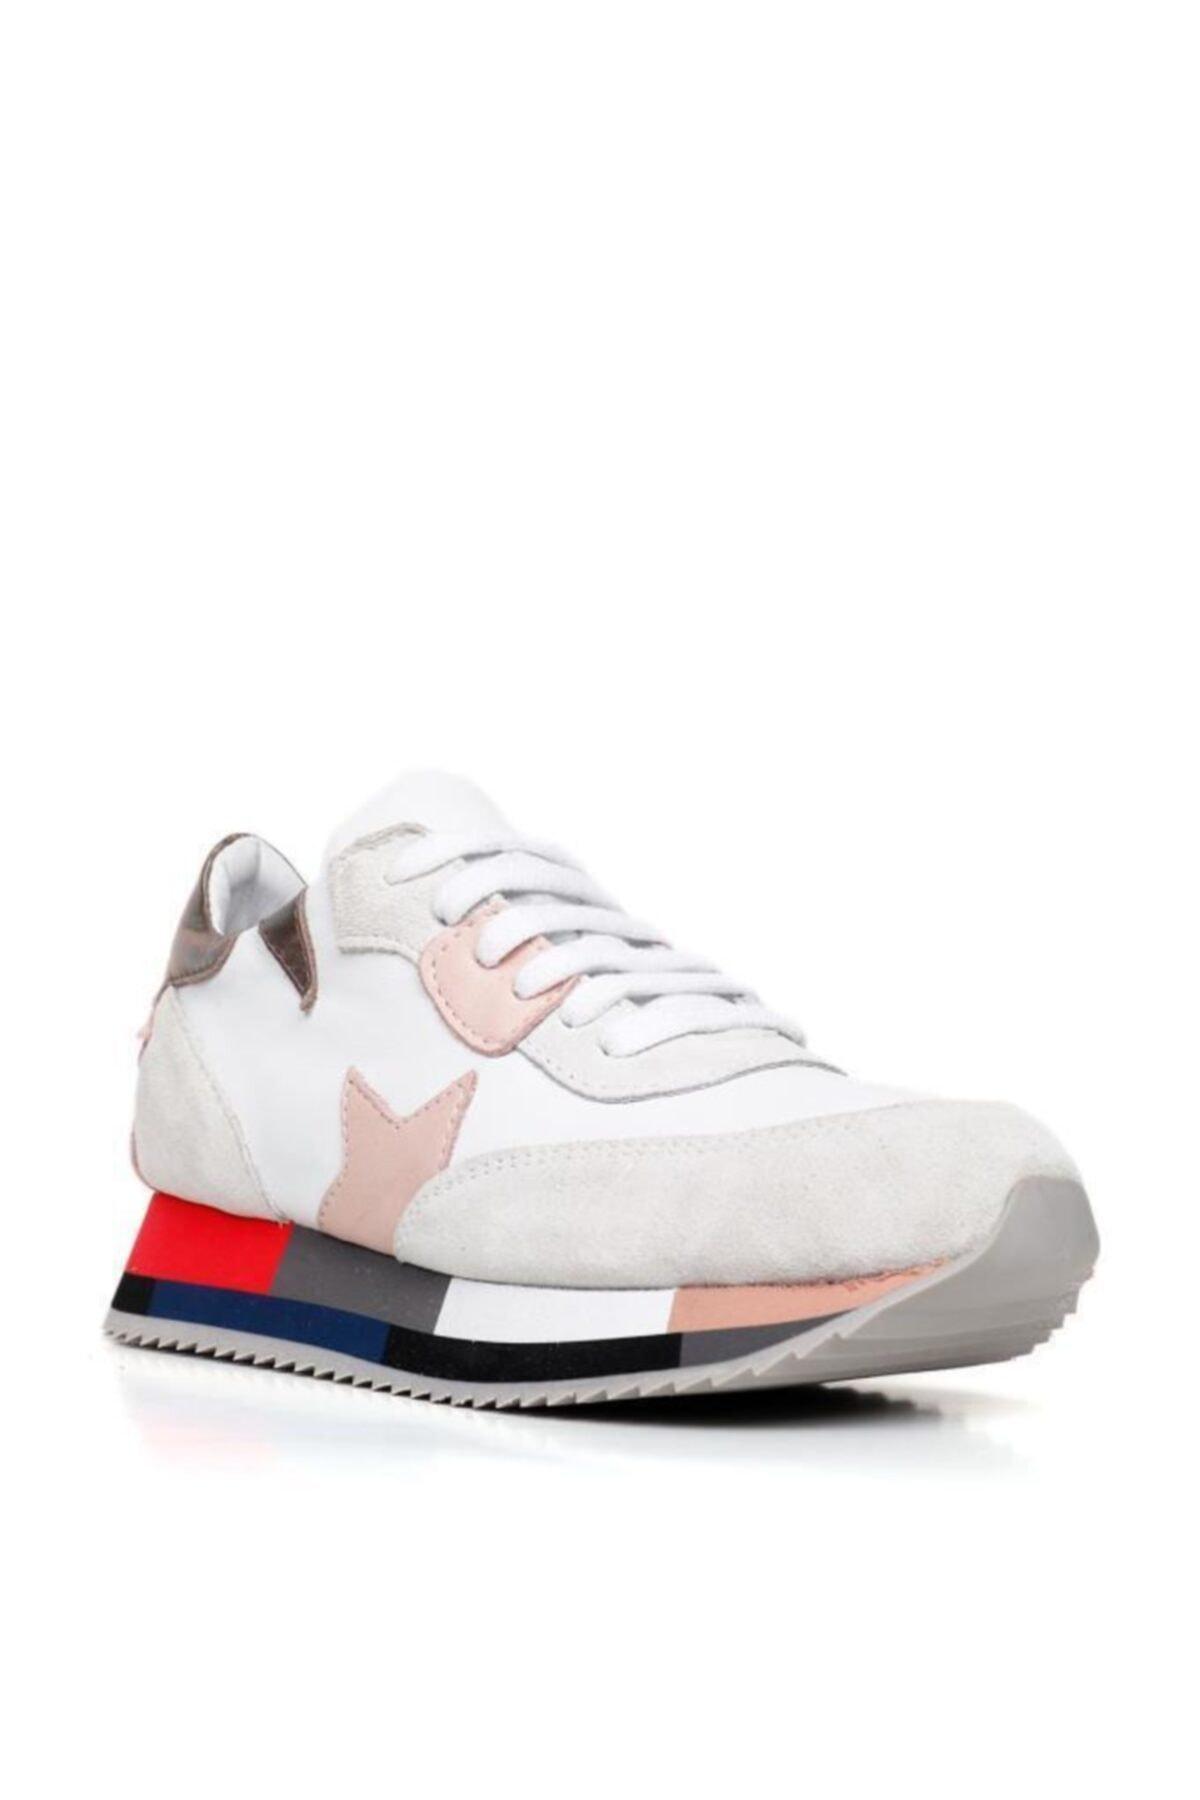 BUENO Shoes Kadın Spor 20wq5400 2